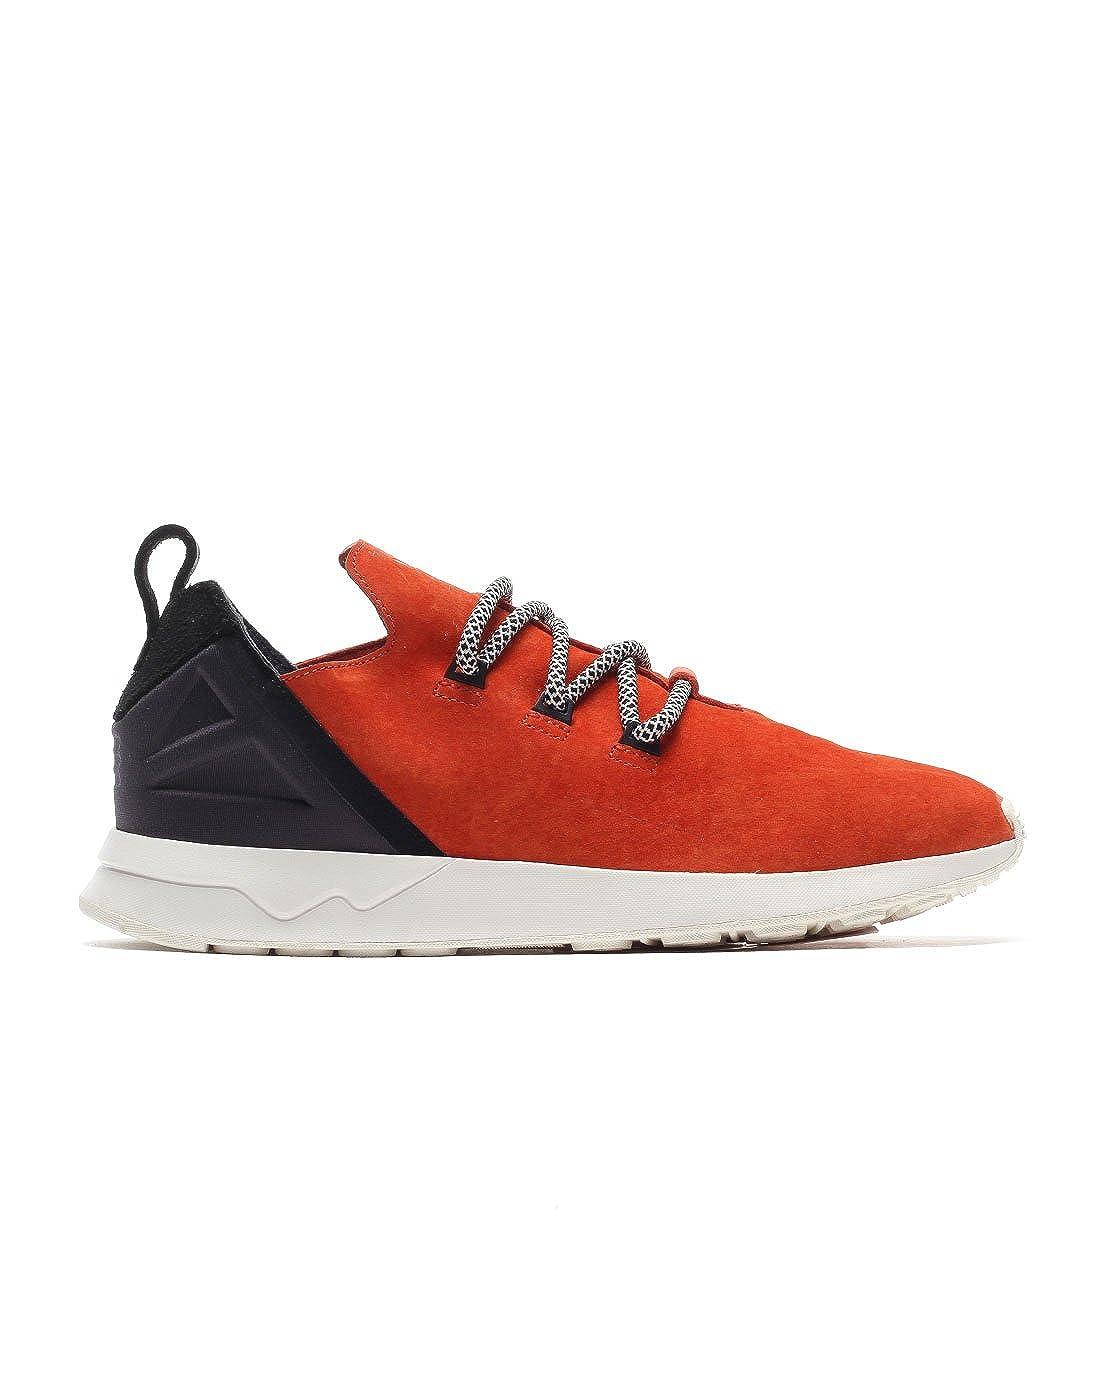 Adidas Originals Herren ZX Flux ADV X Turnschuhe Schuhe -Rost